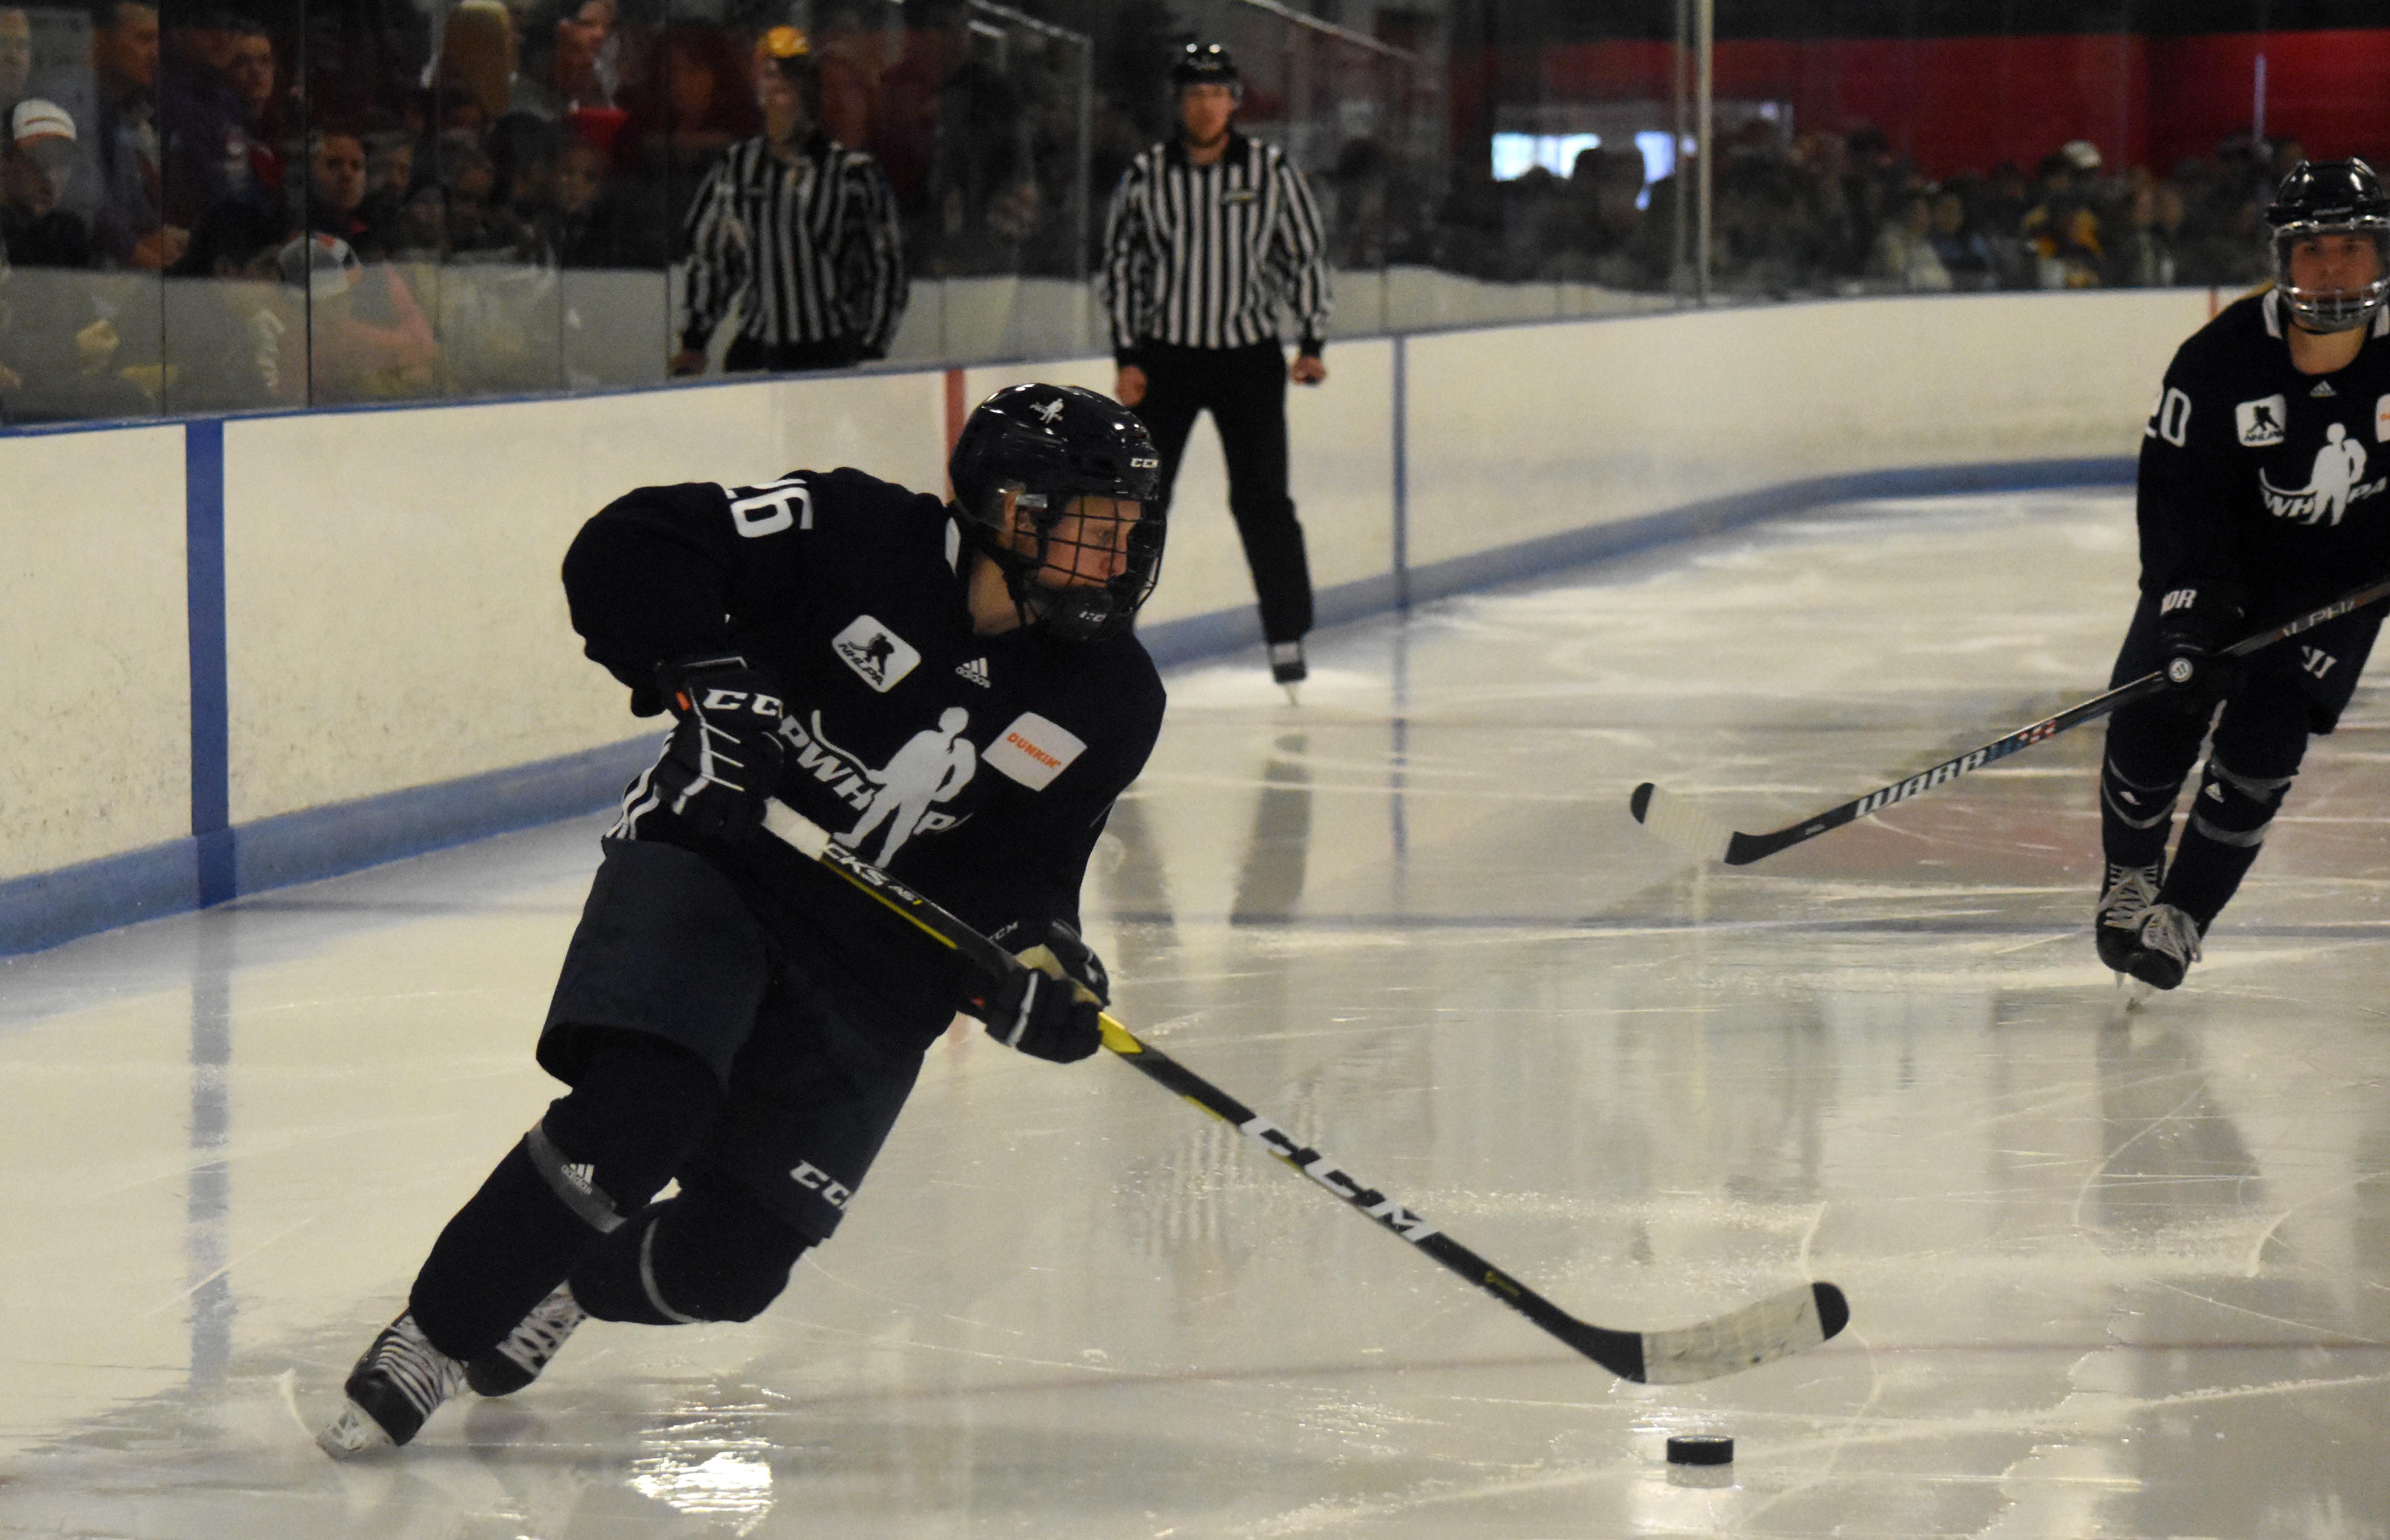 Blackhawks Hire PWHPA's Kendall Coyne Schofield